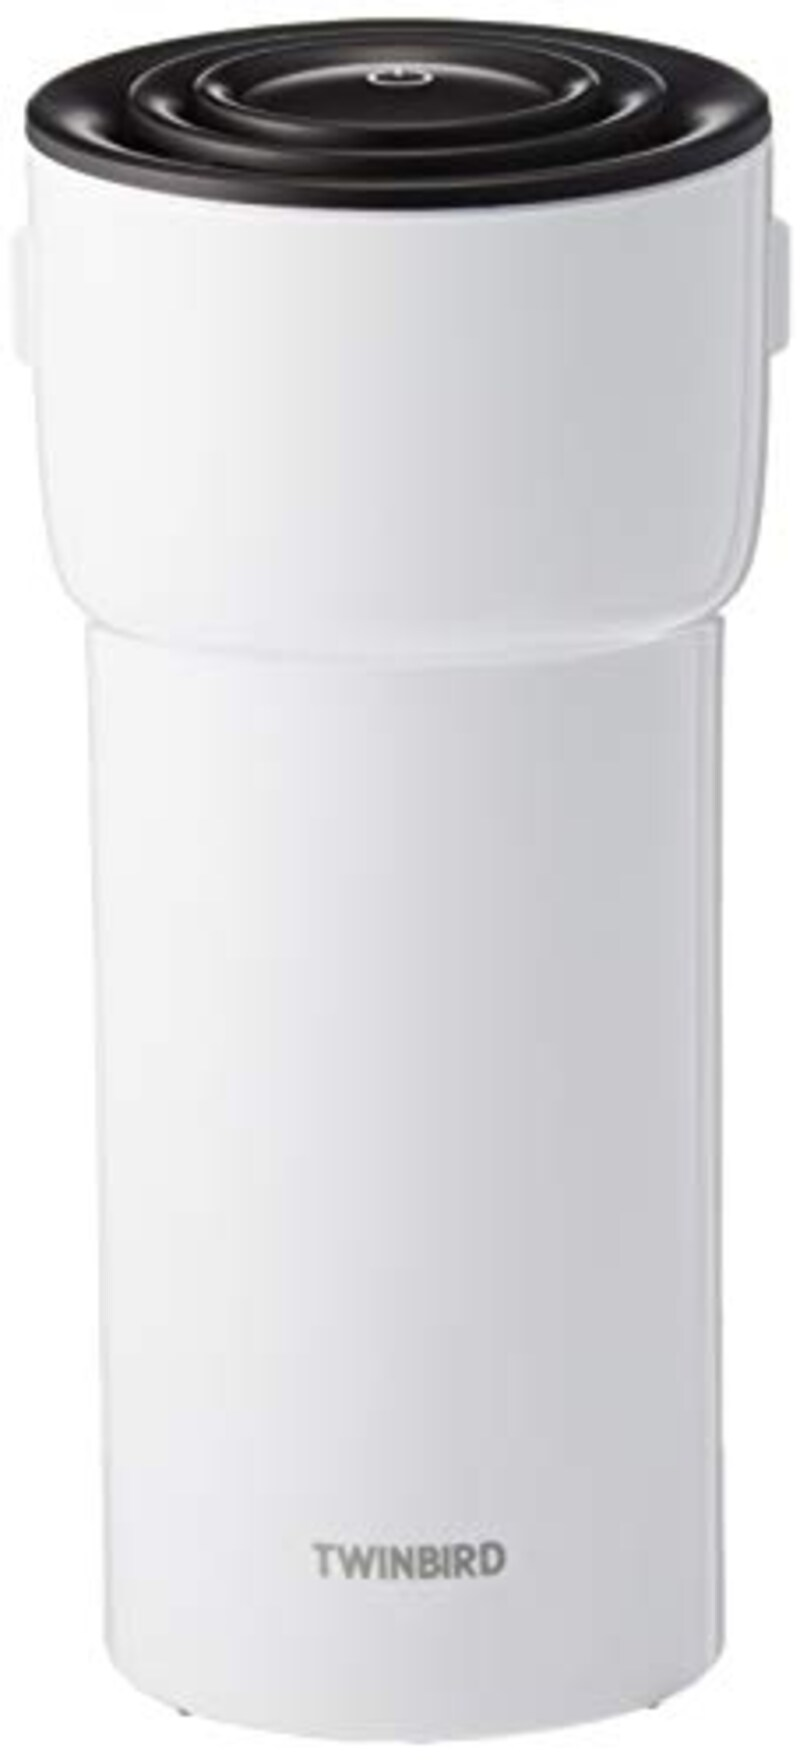 TWINBIRD(ツインバード工業),HEPAフィルター付イオン発生器 AIR BOTTLE,AC-5942W